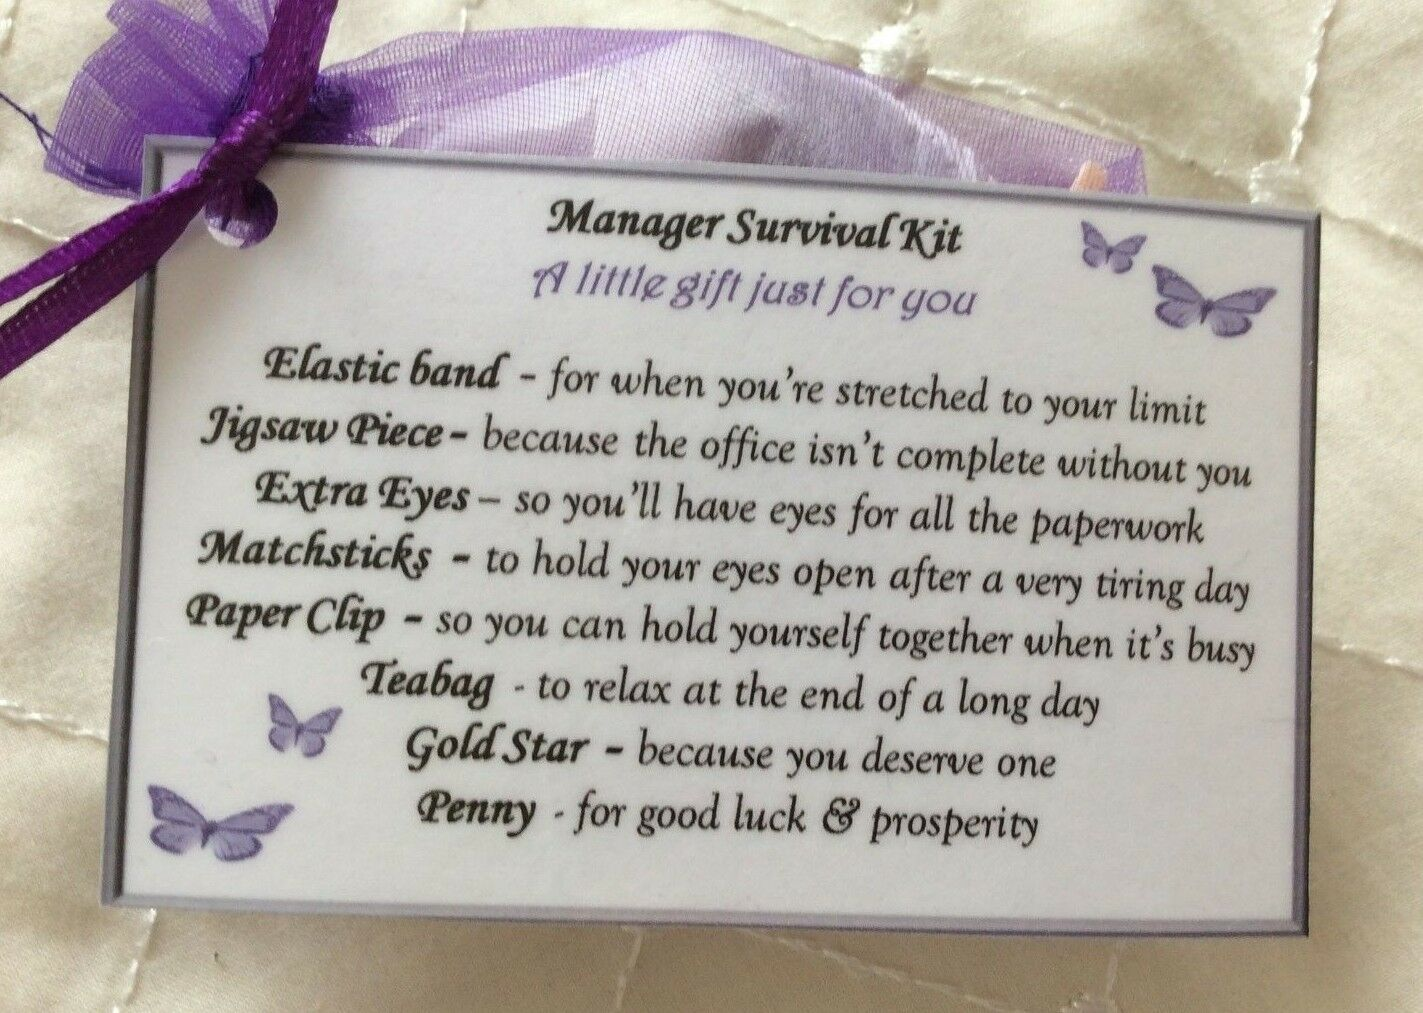 New job, work gift, Secret santa gift for manager SMILE GIFTS UK Manager Survival Kit Gift